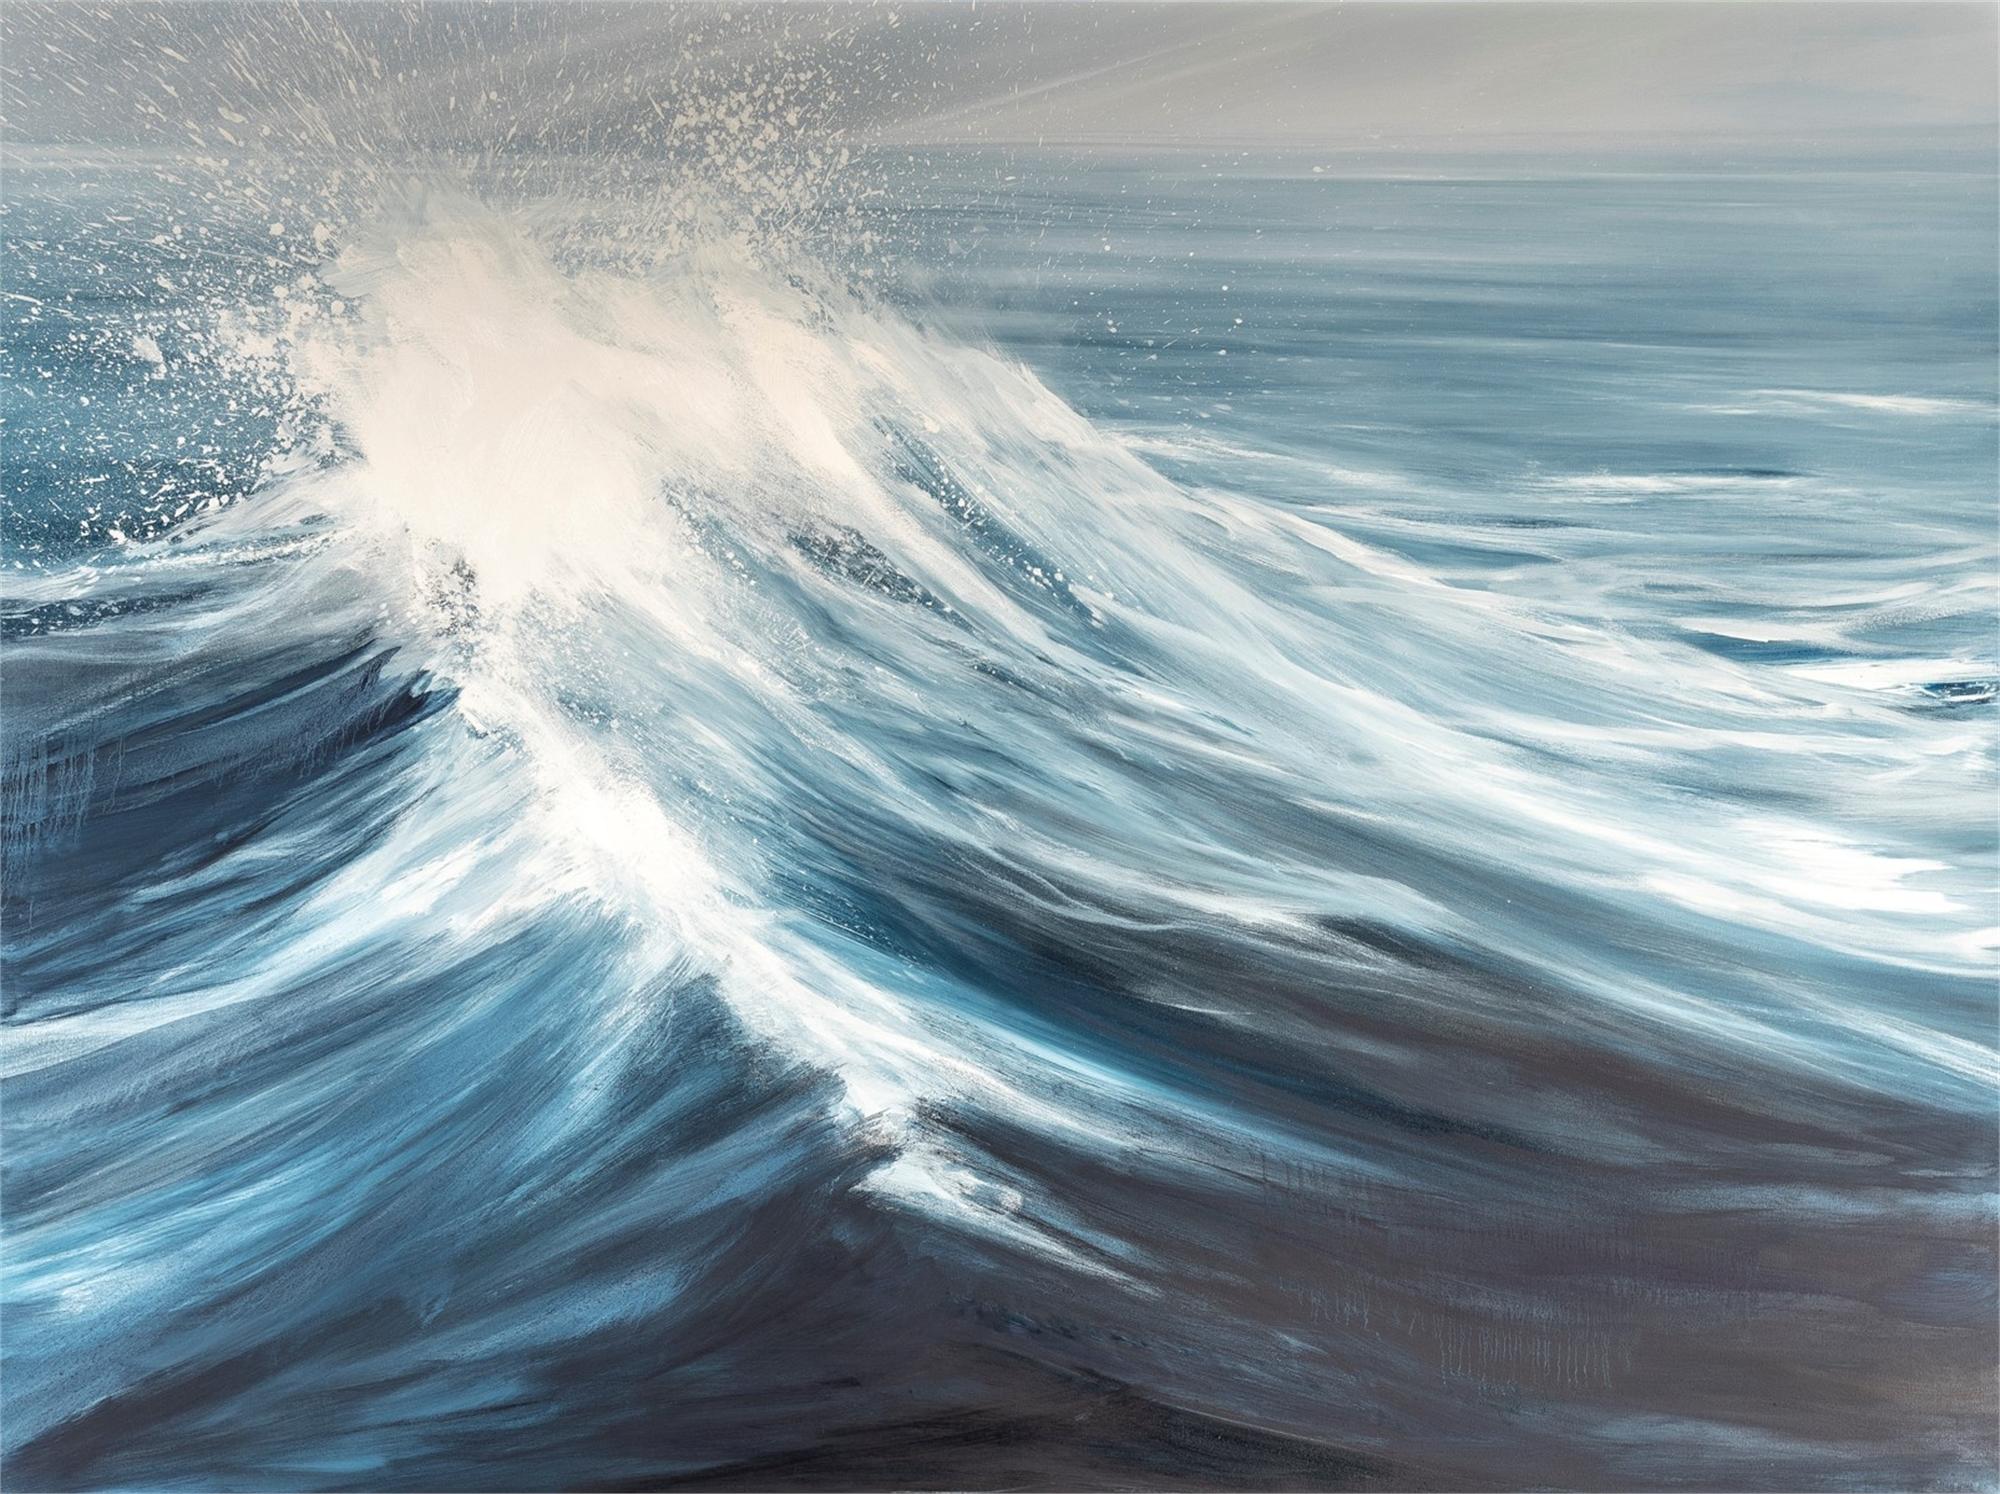 Thornton by Jonathan Saiz